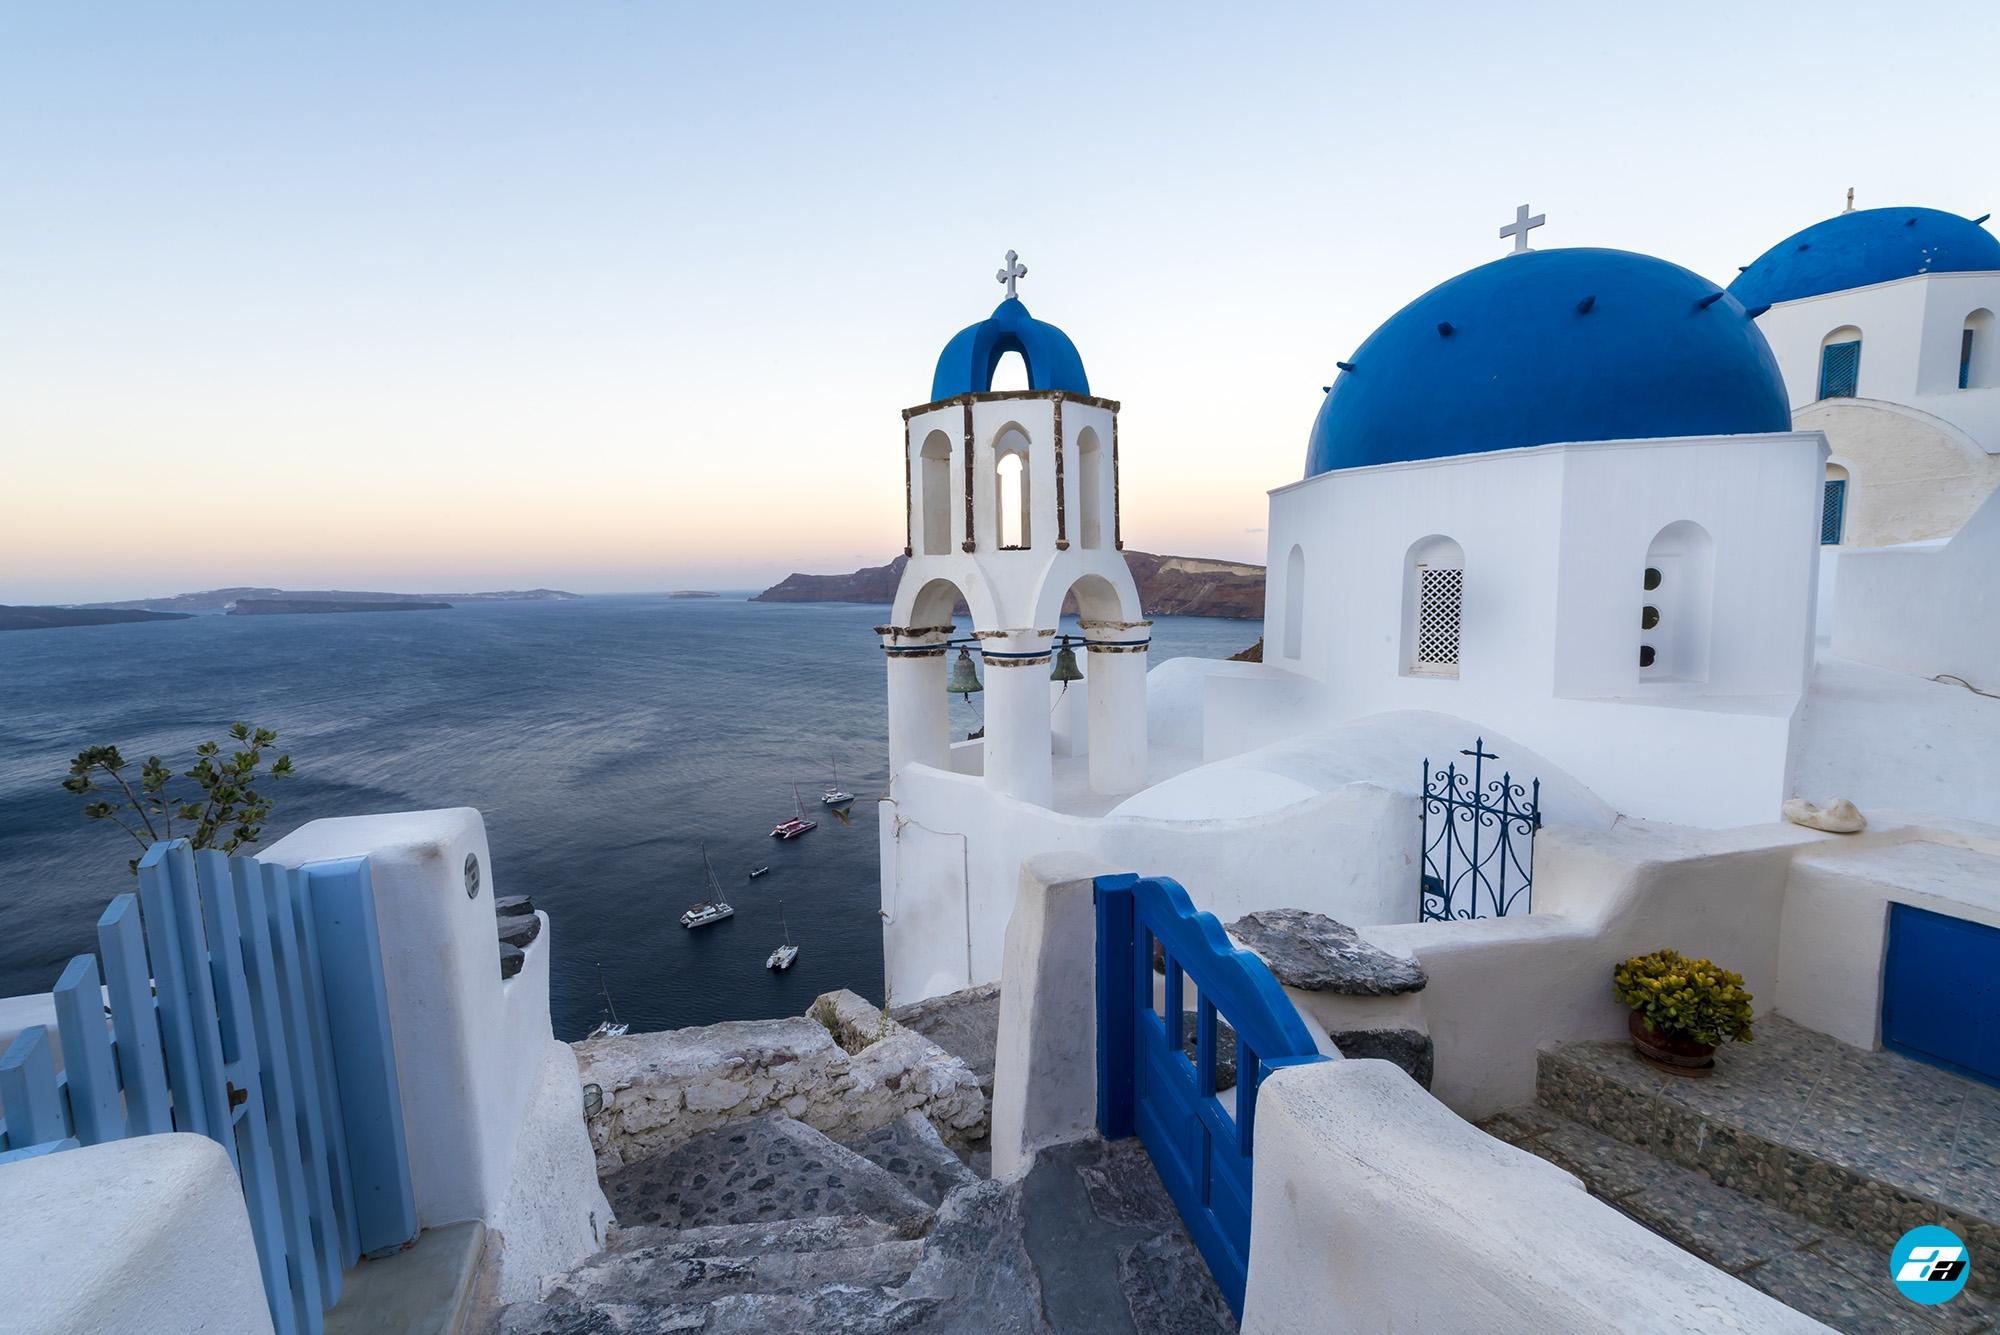 Oia, Santorini, Greece. Blue Domes of Oia. Santorini View.